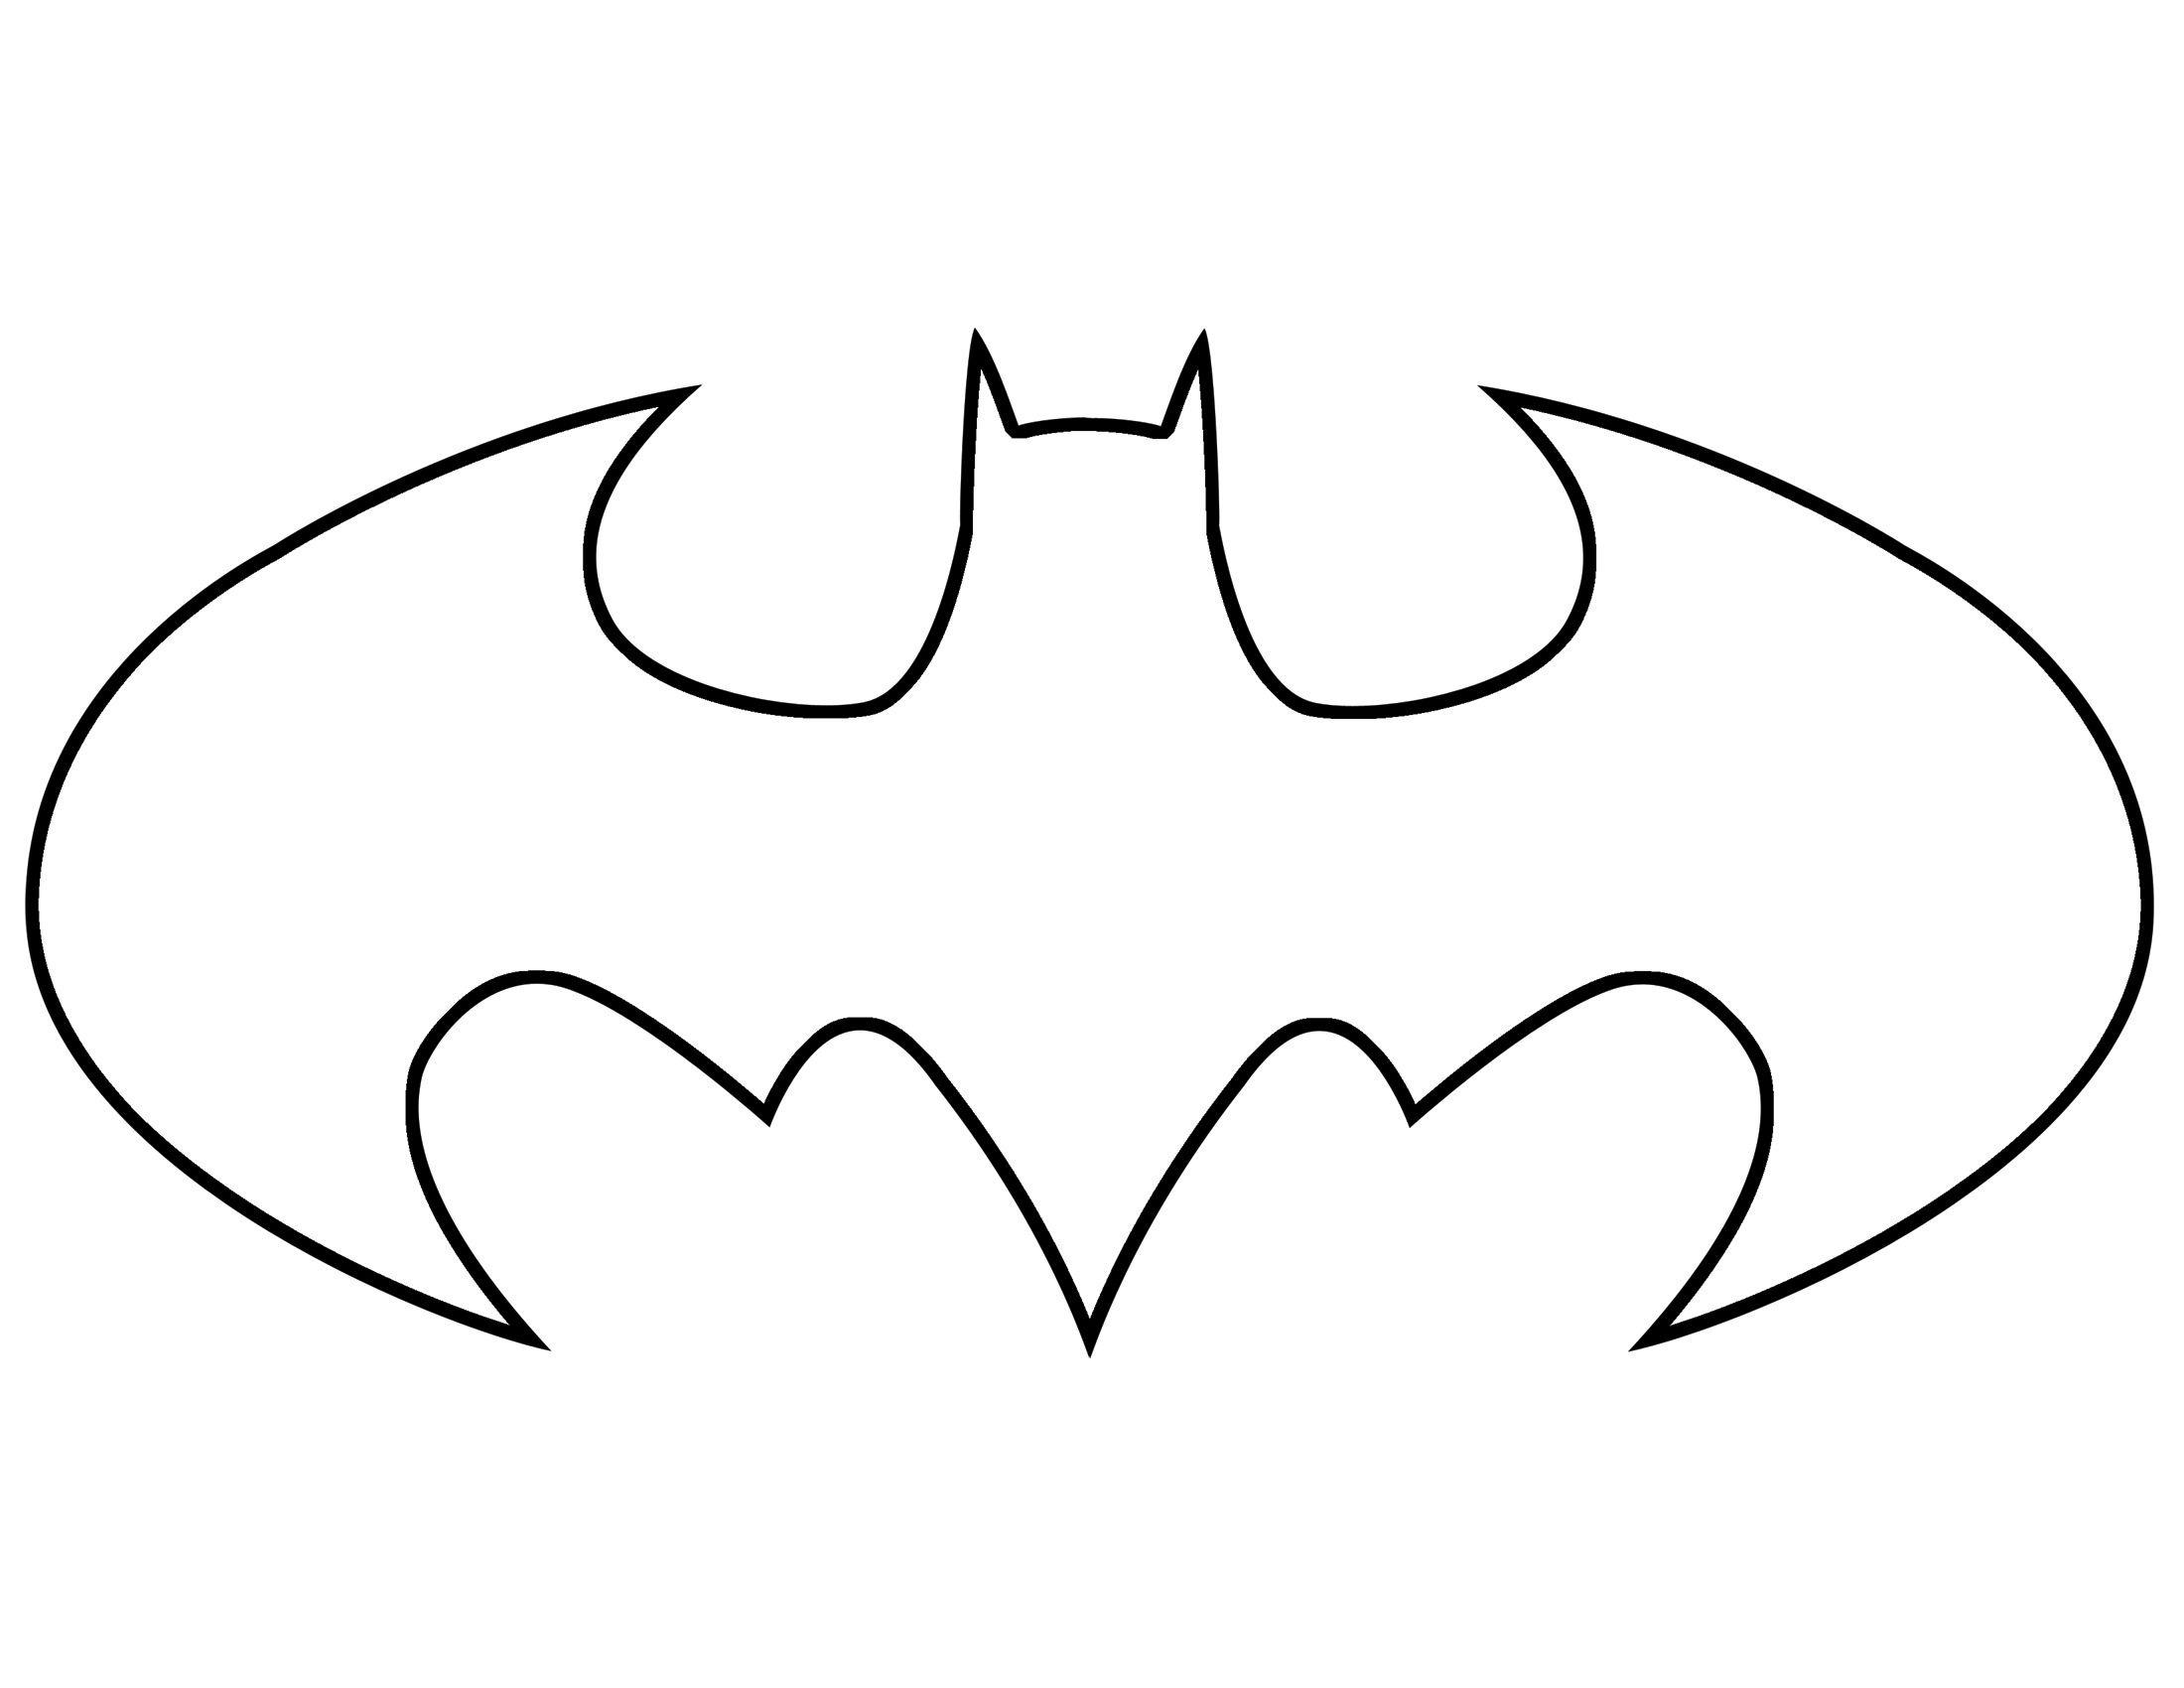 Free Pumpkin Stencils |  Stencils Provided Below Plus Batwoman - Superhero Pumpkin Stencils Free Printable